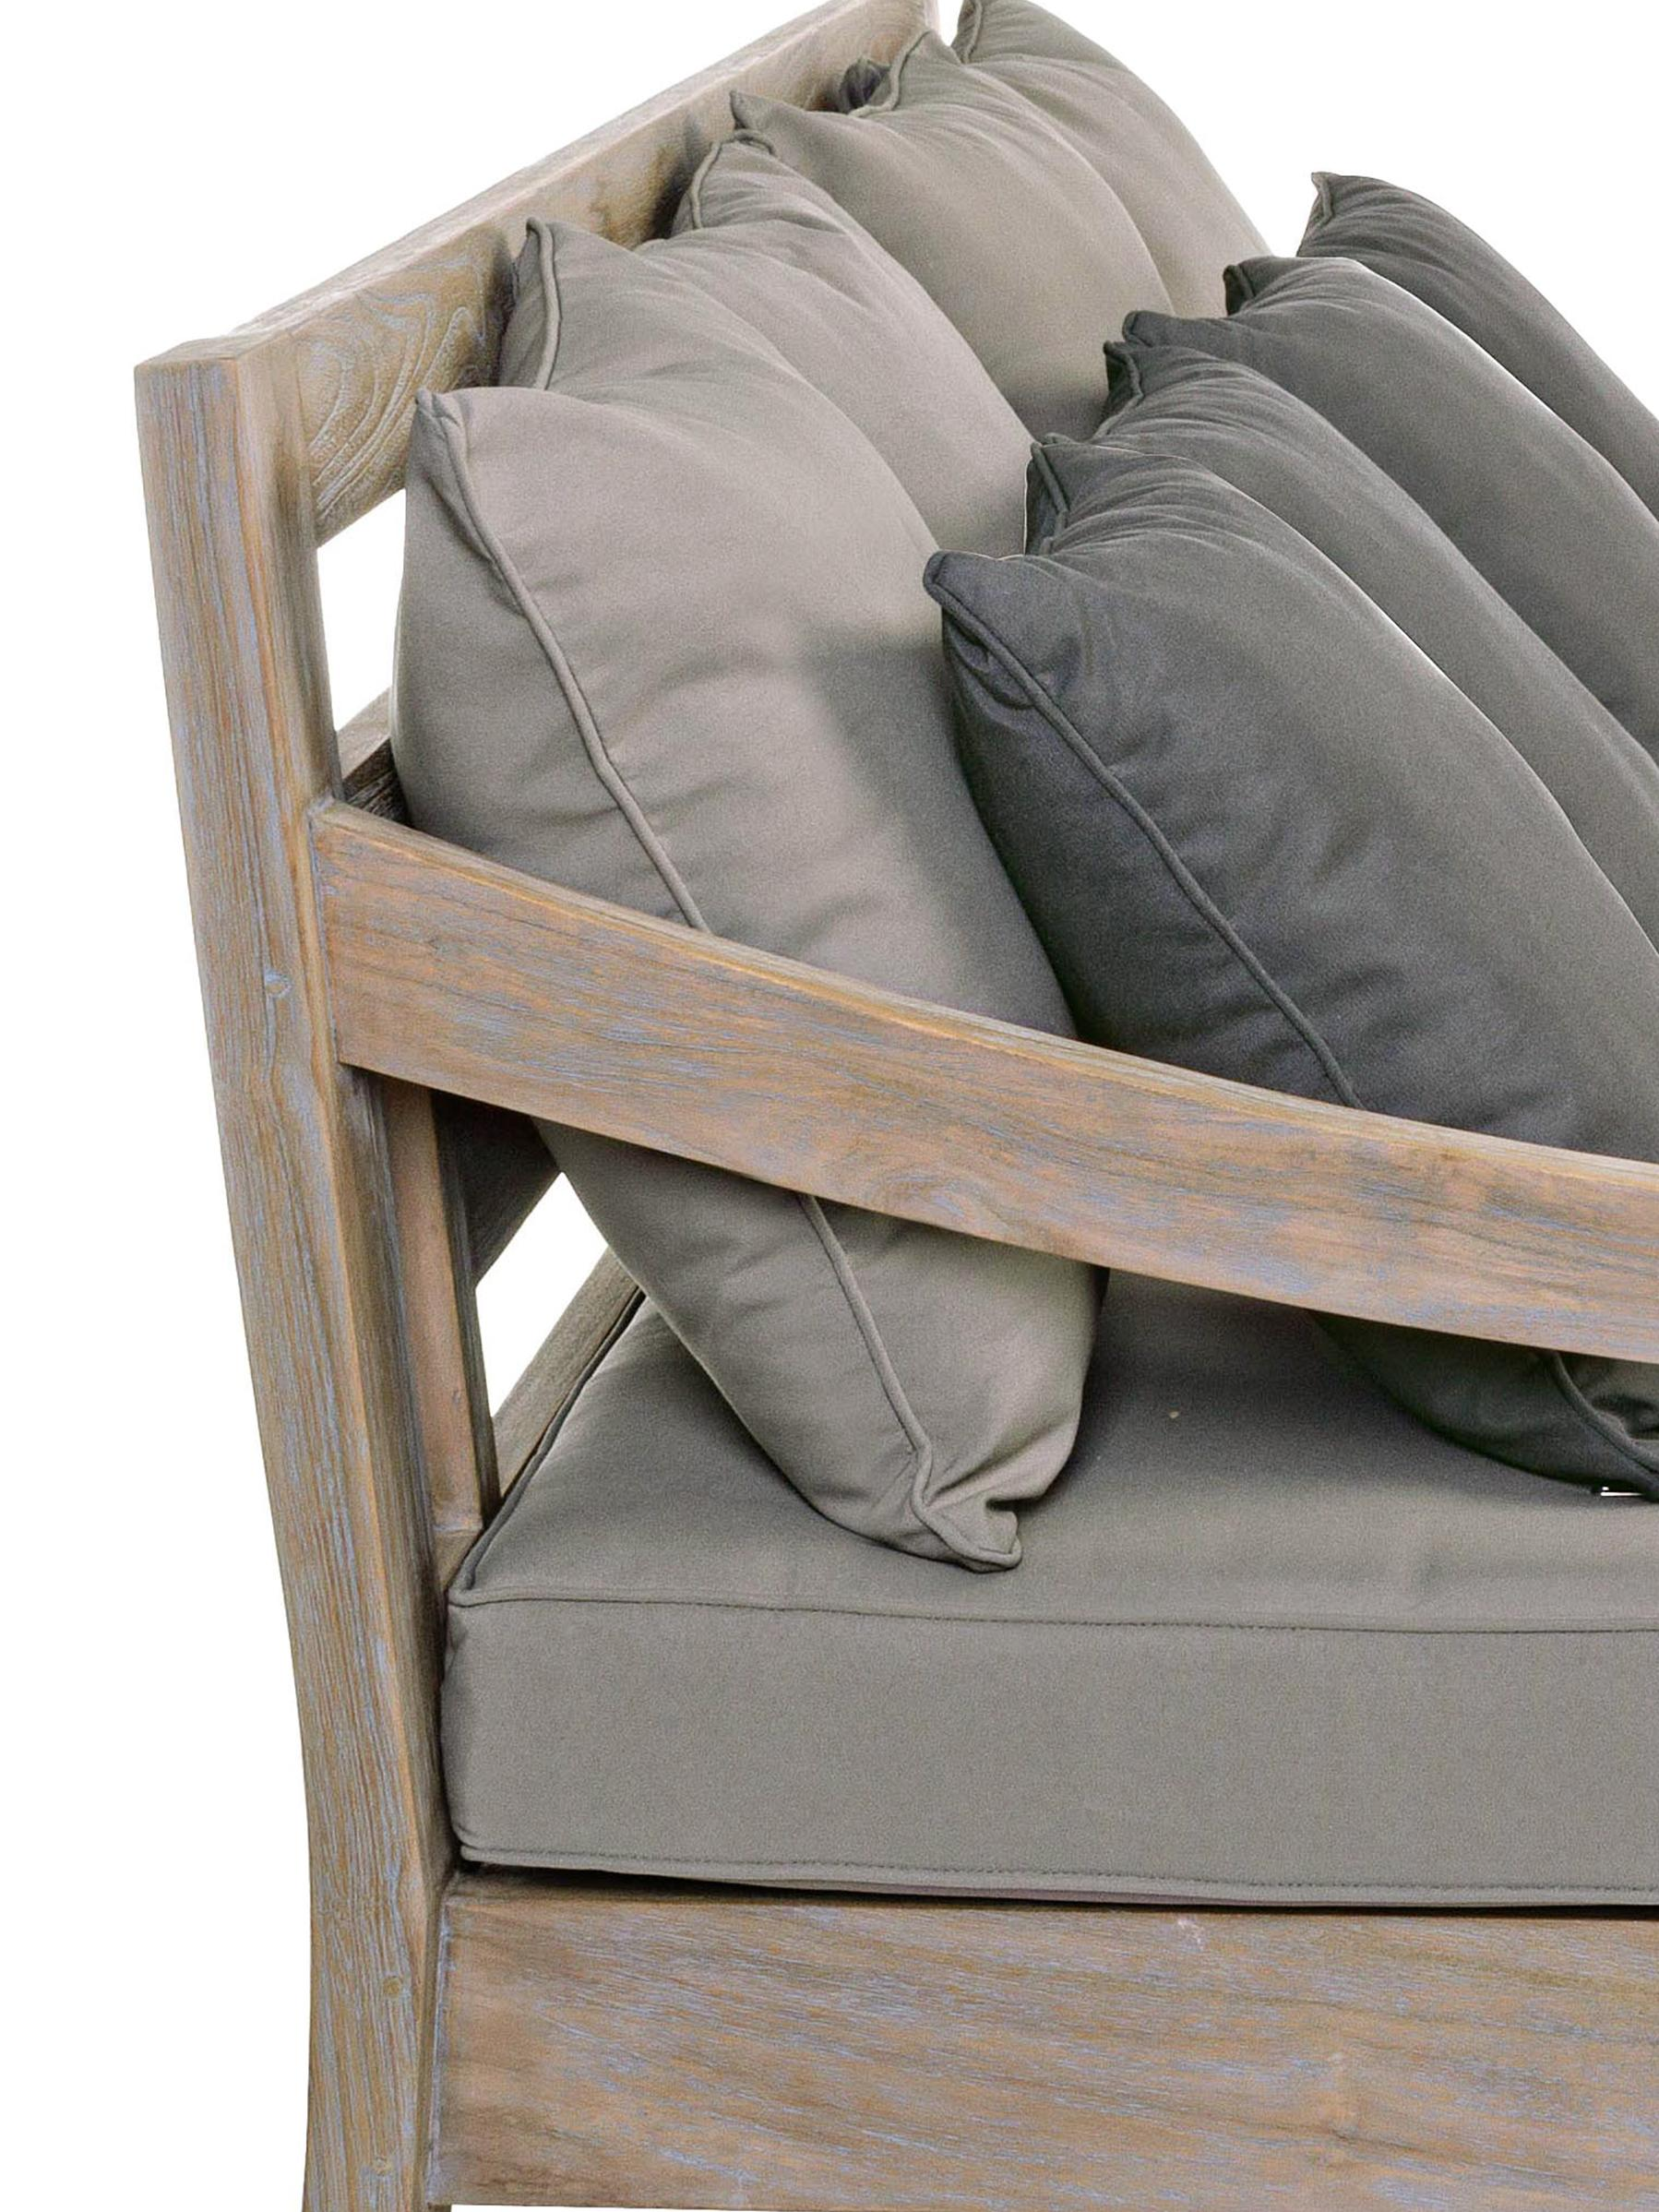 Outdoor loungebank Bali van teakhout (3-zits), Frame: teakhout, Bekleding: 100% polyester, UV- en wa, Frame: teakhoutkleurig. Bekleding: grijs, B 190 x D 112 cm